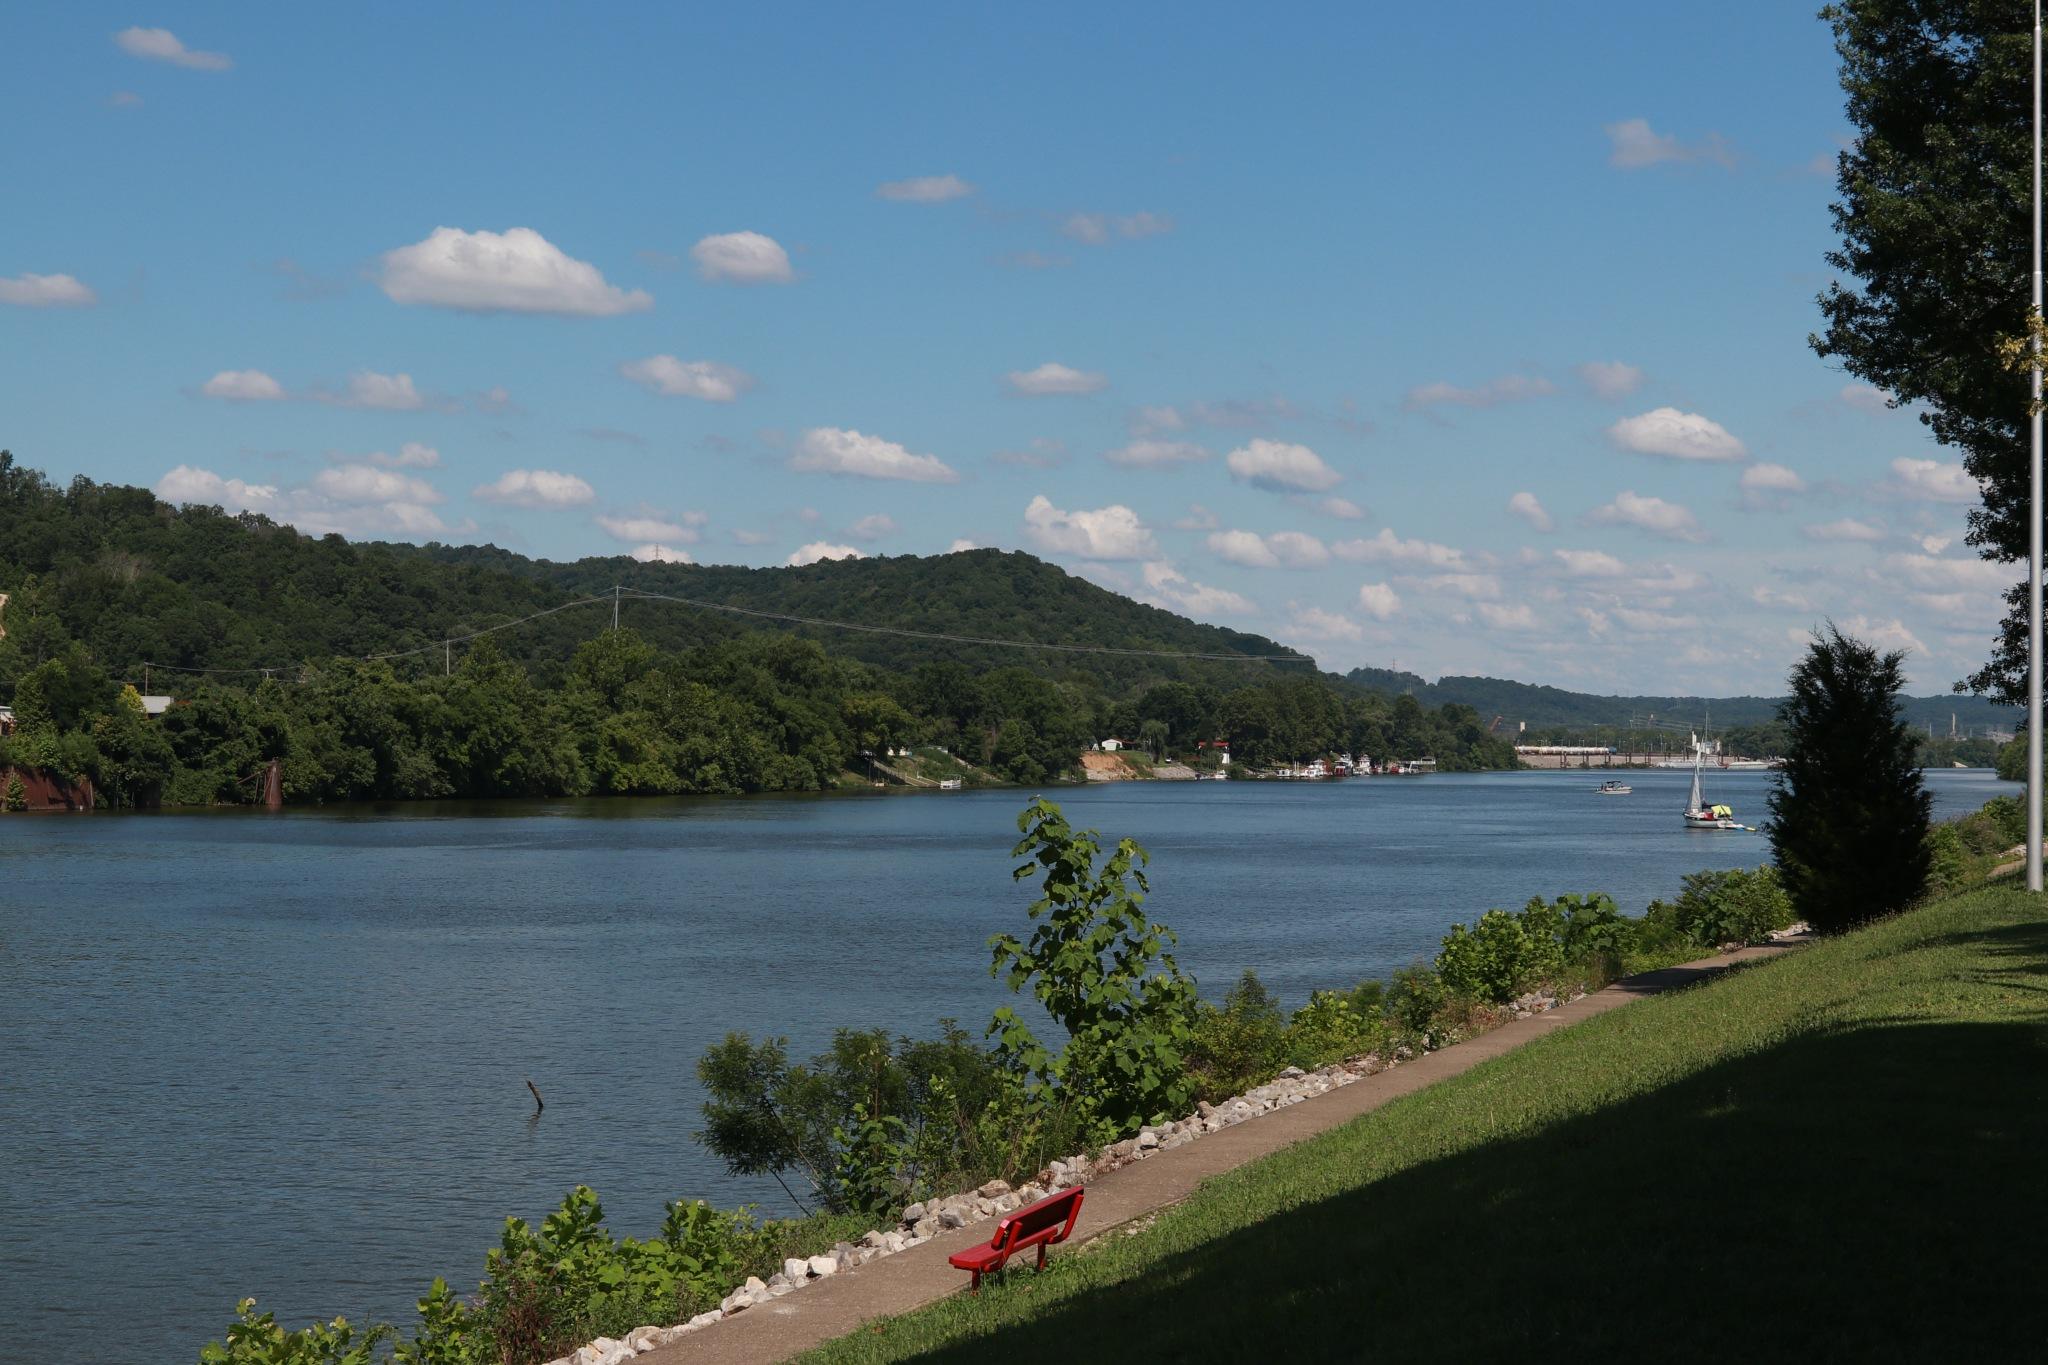 Kanawa river. Saint Albans WV. by James B Justice